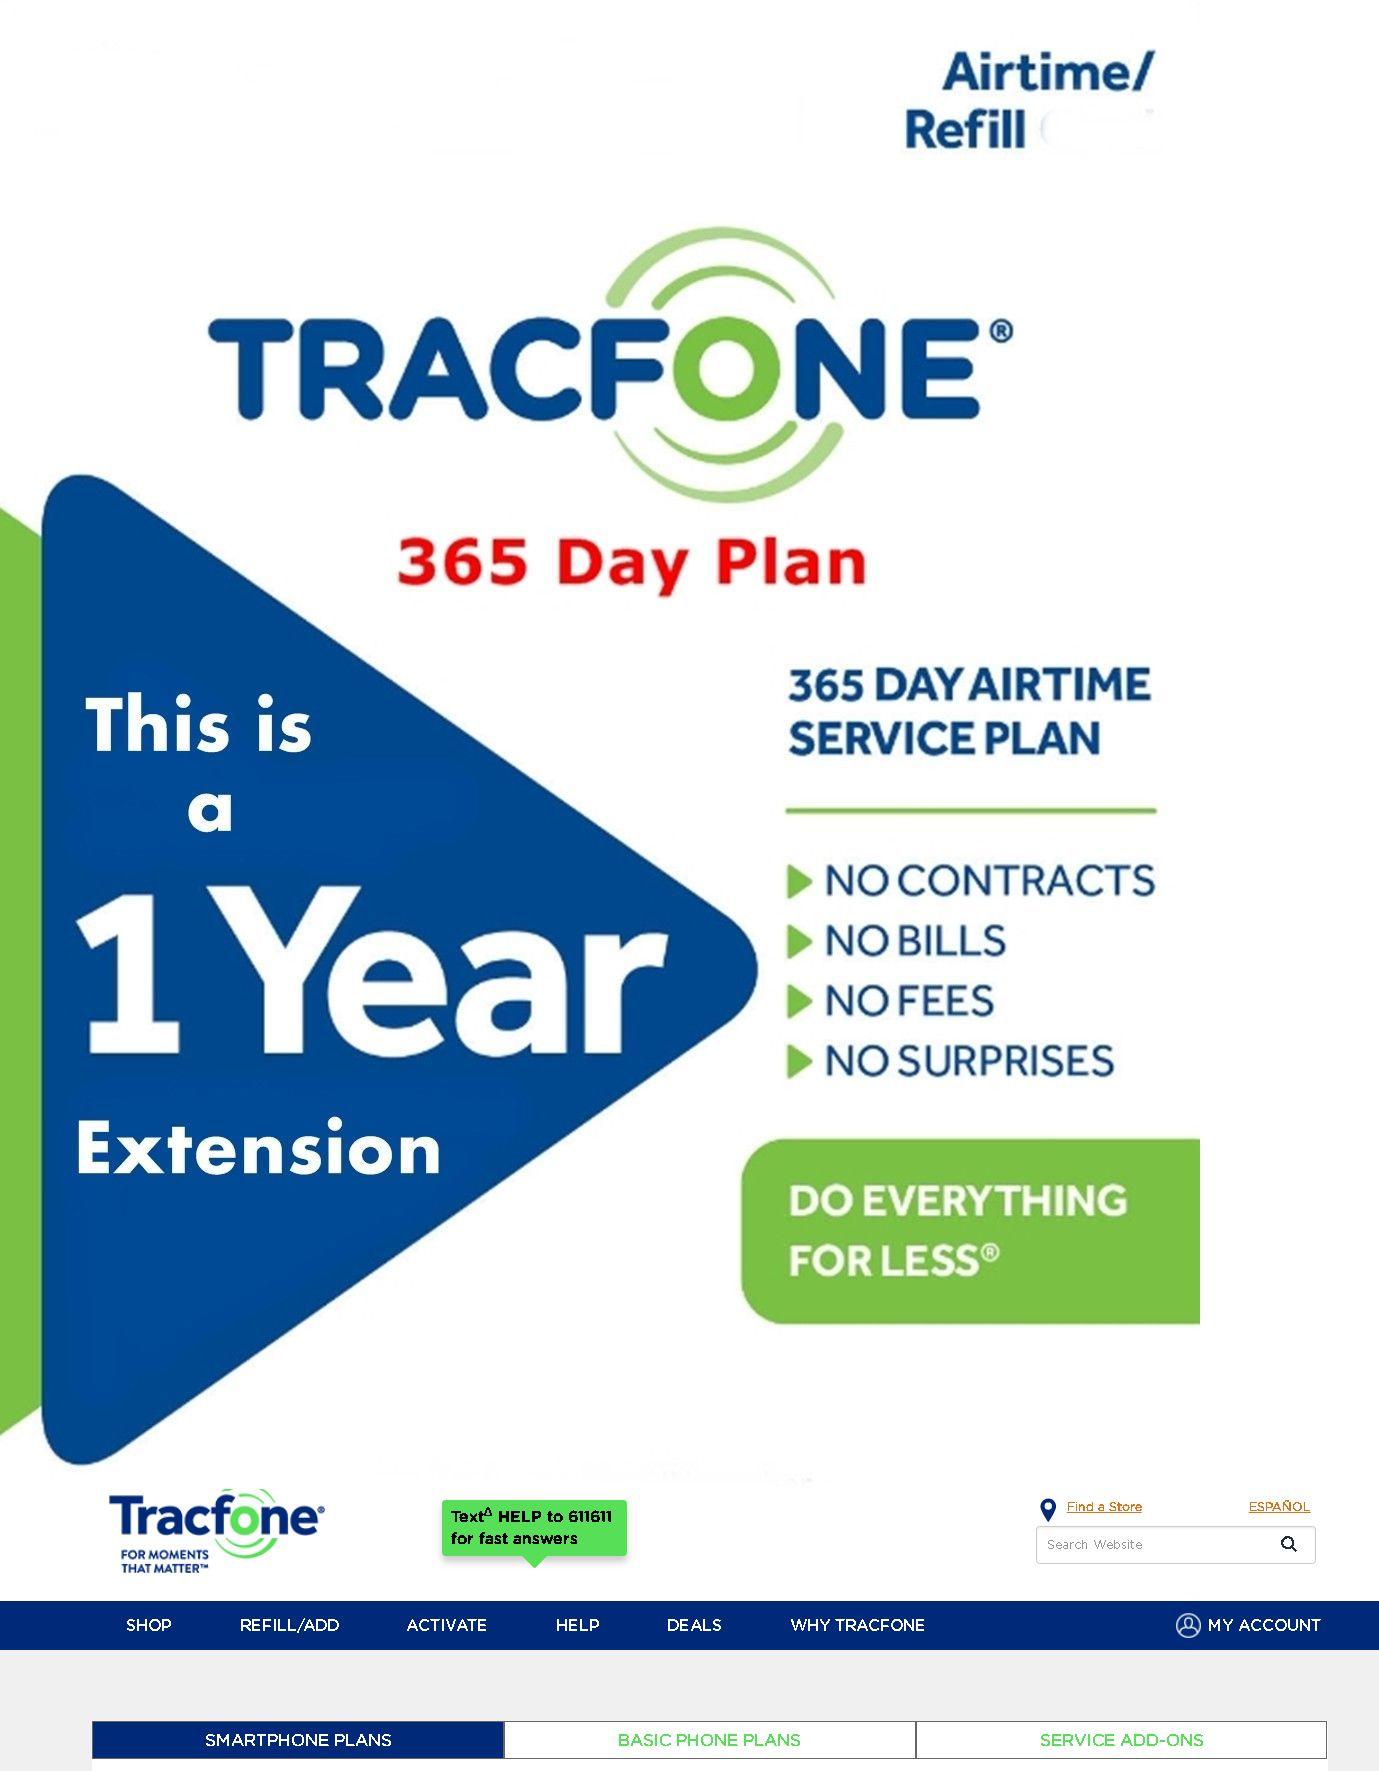 Phone And Data Cards 43308 Tracfone 1 Year 365 Days Service Extension Smartphone Digital Refill No Minu International Sim Card Travel Sim Card Verizon Prepaid